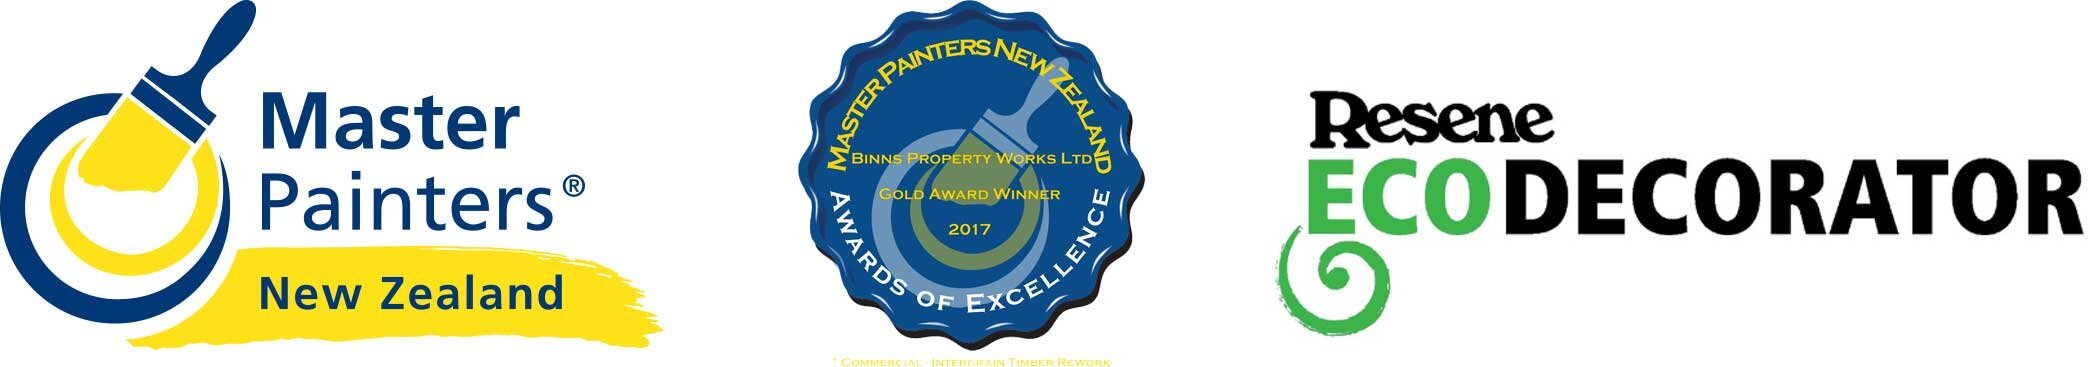 Master Painters, Gold Award and Resene Eco Decorators logos